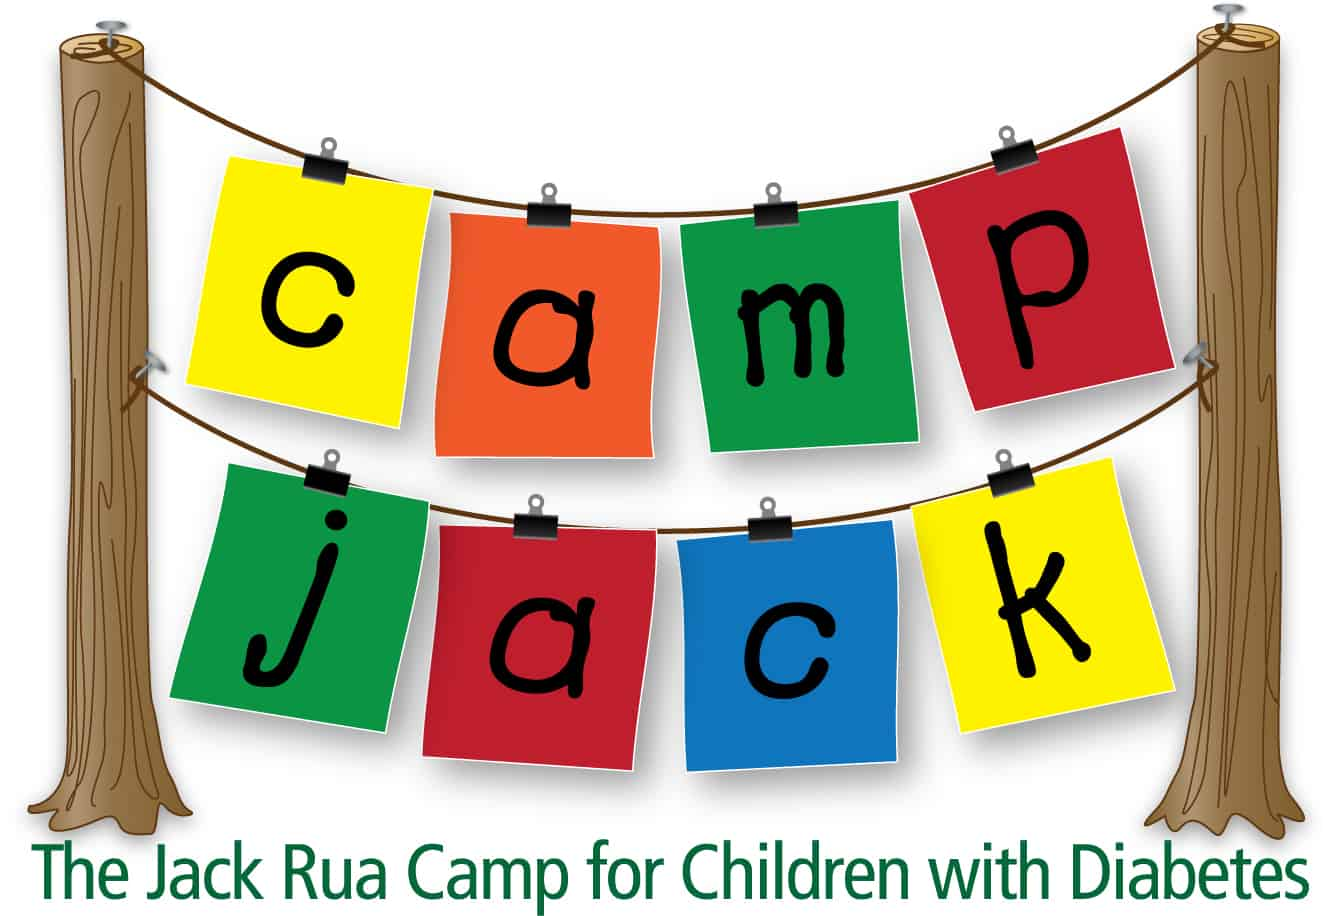 the Camp Jack logo